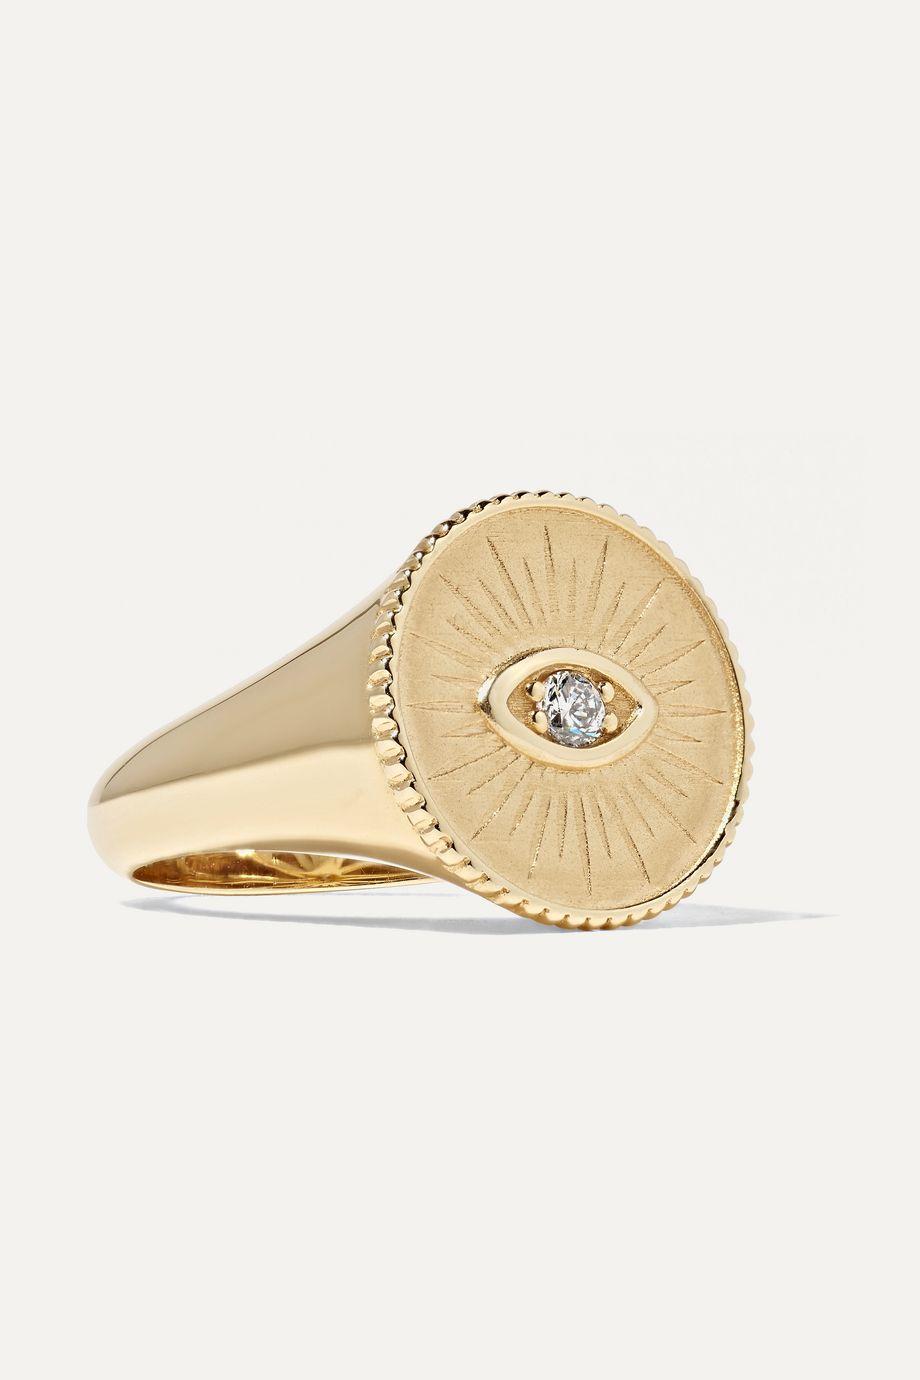 Sydney Evan 14-karat gold diamond signet ring